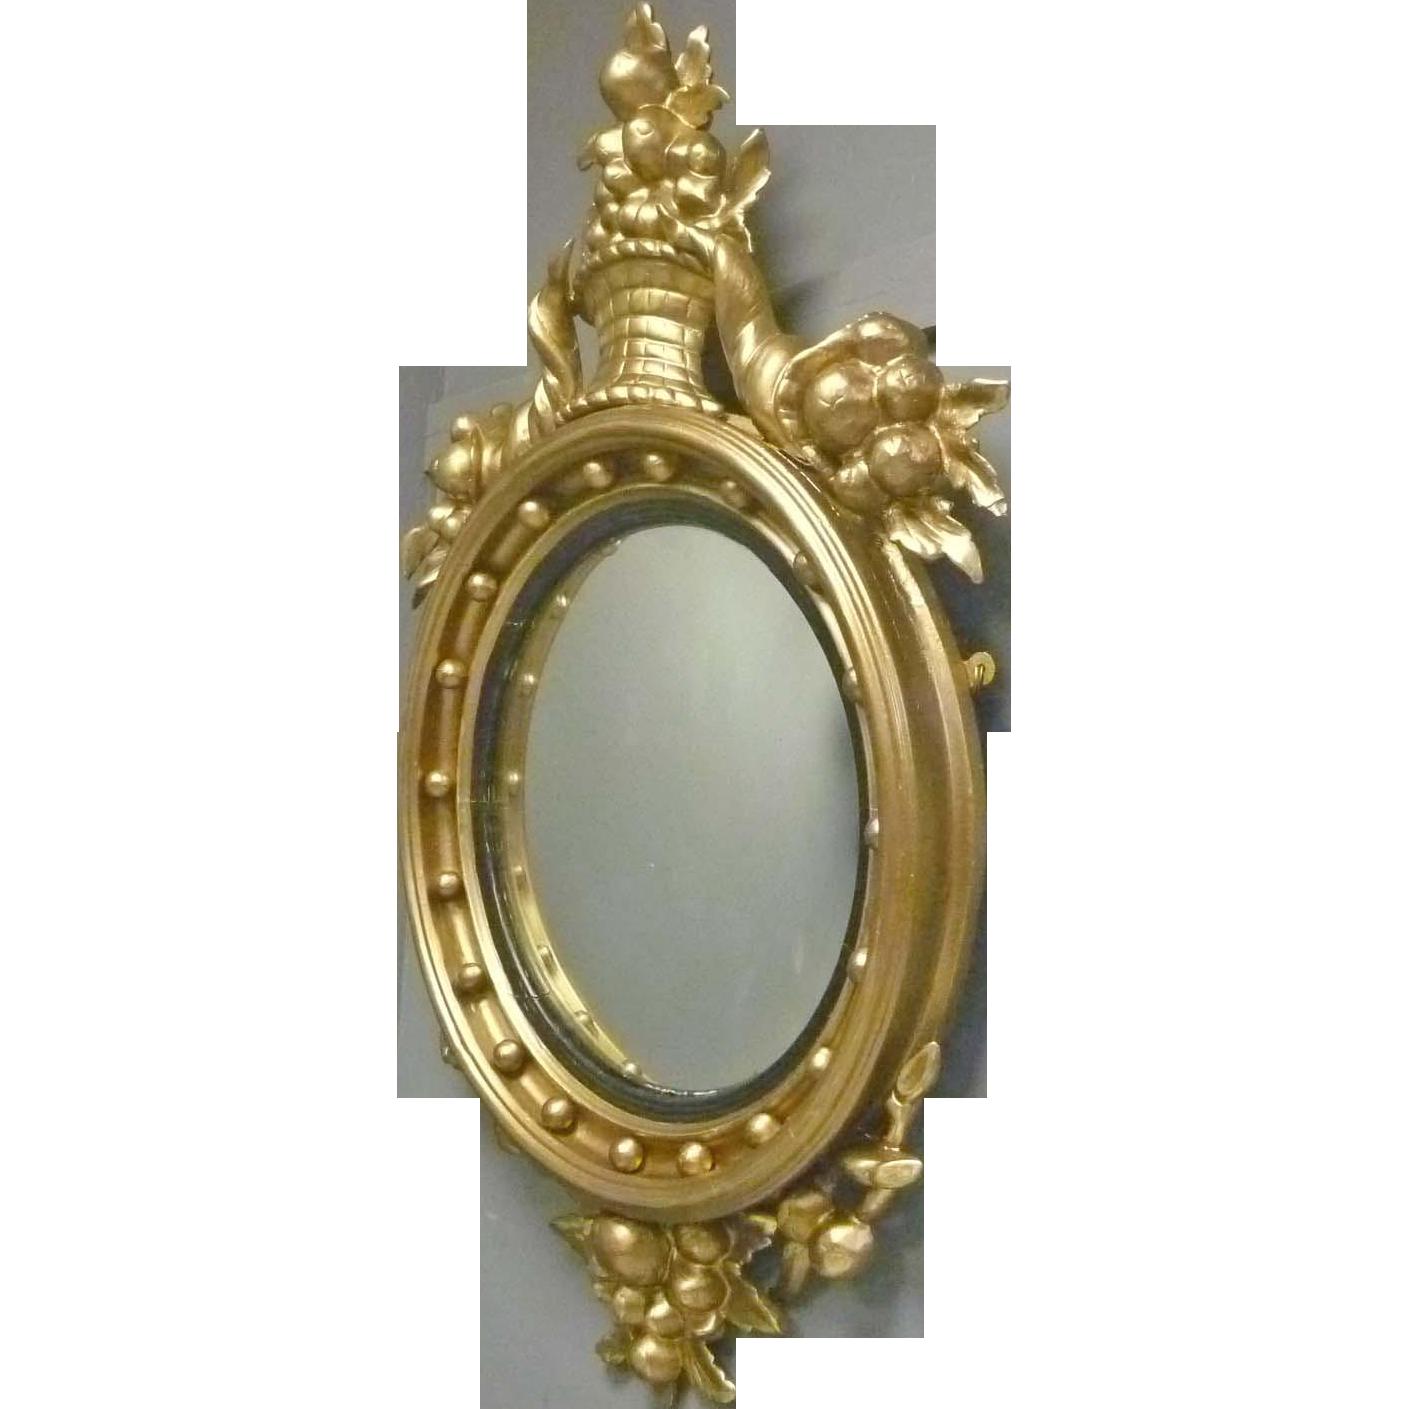 Early Convex Mirror with Cornucopias